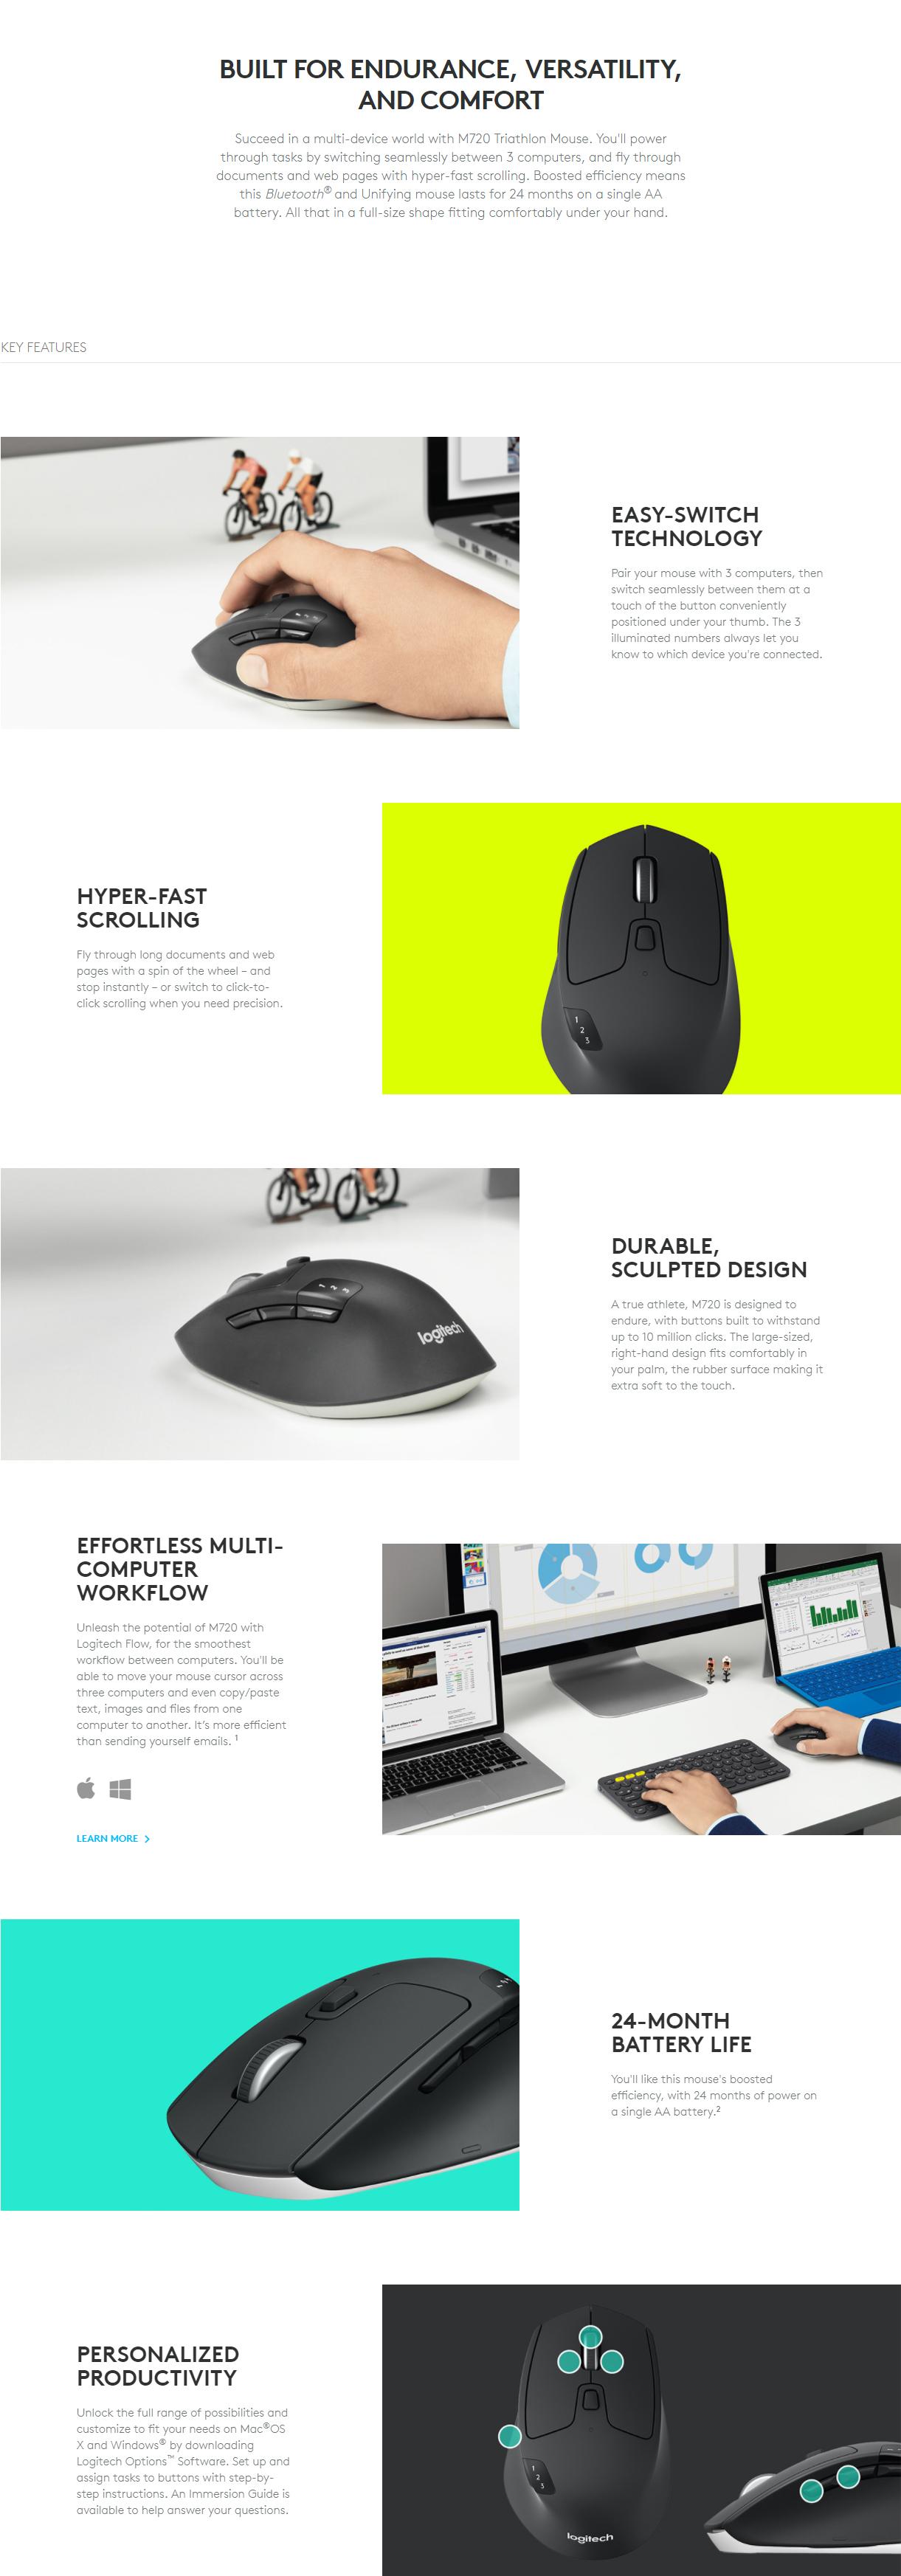 Product details of Logitech M720 Triathlon Multi device Wireless Optical Mouse Black